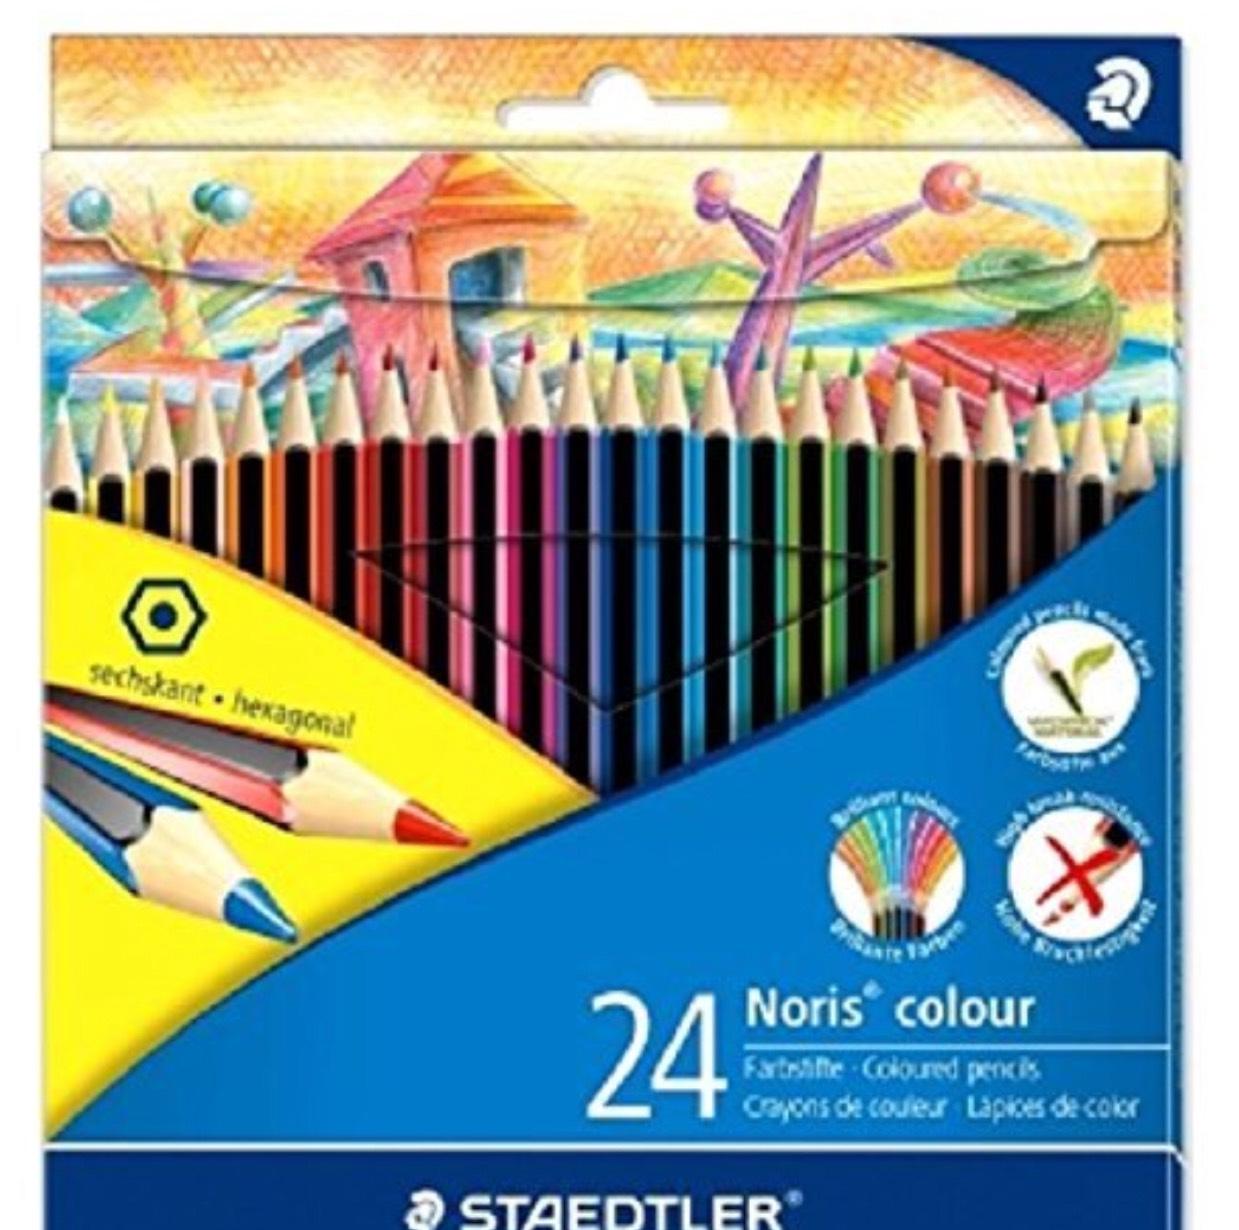 Staedtler 185 C24 Noris Colour Colouring Pencil - Assorted Colours £3.50 @ Amazon (Add On item)